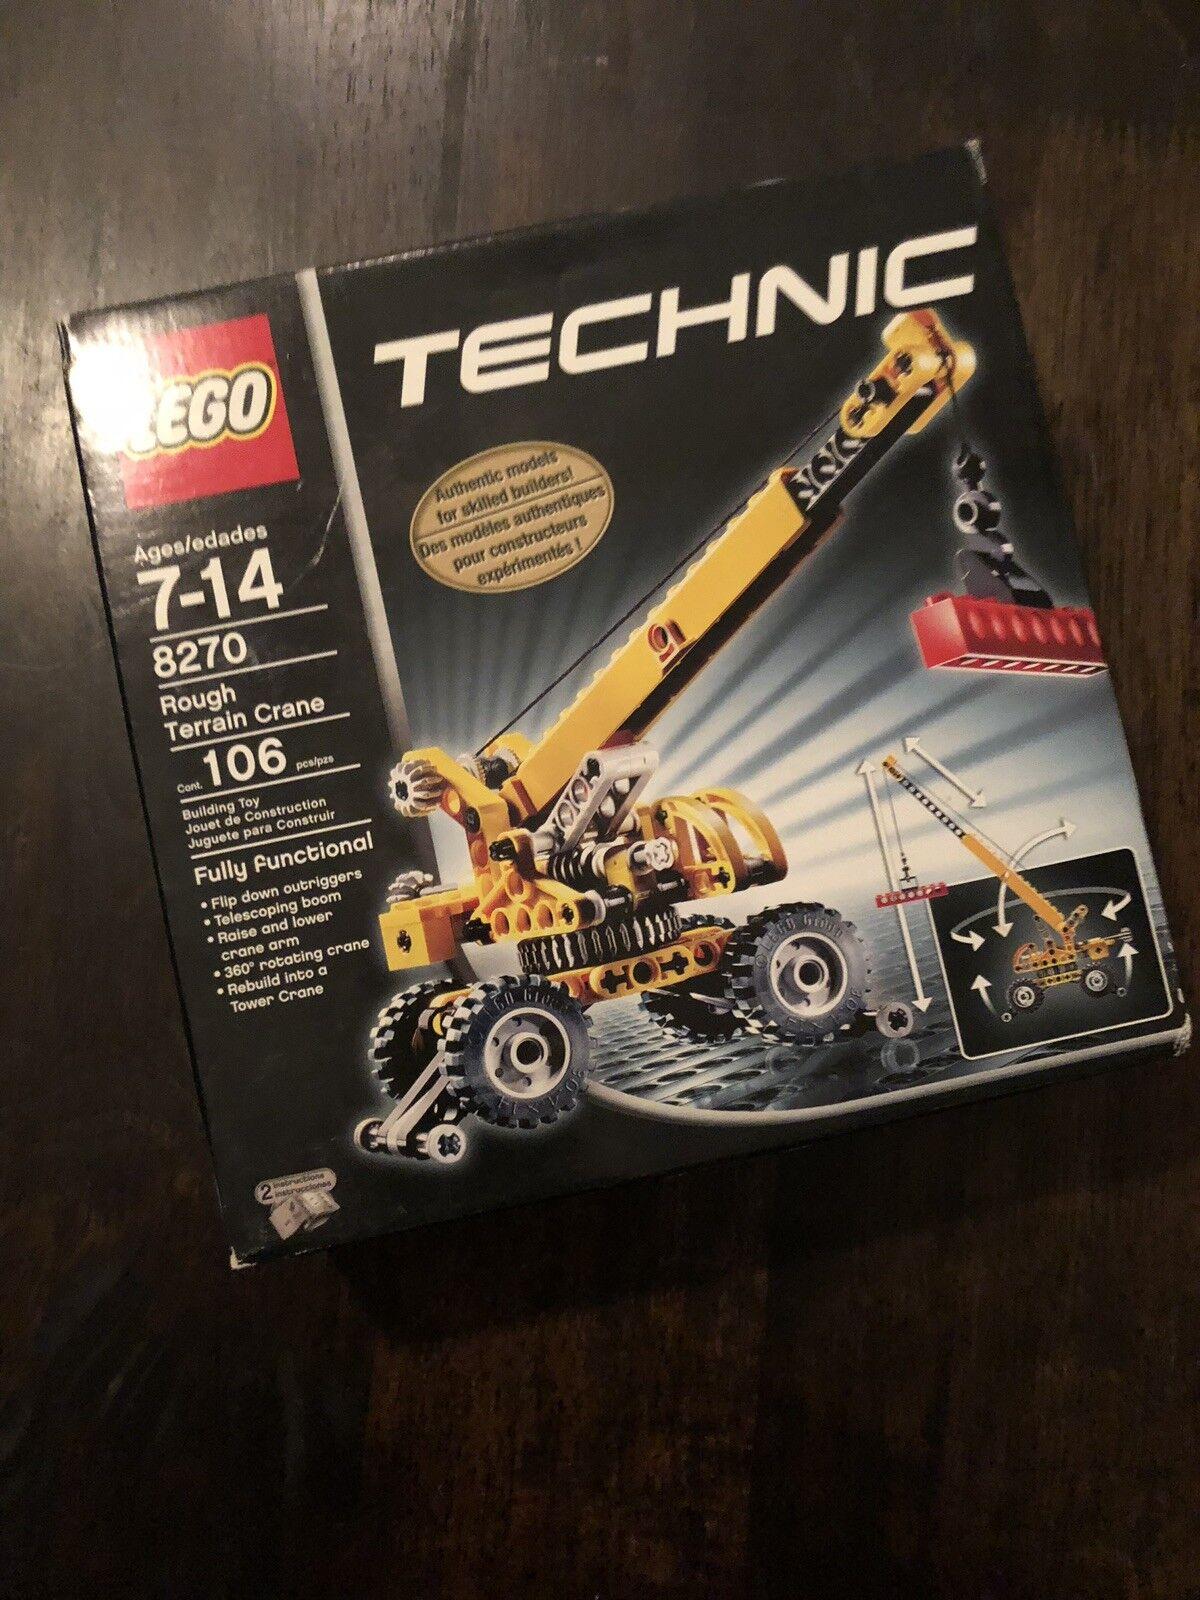 Lego Technic Rough Terrain Crane  8270 - New, Factory Sealed, Retirosso